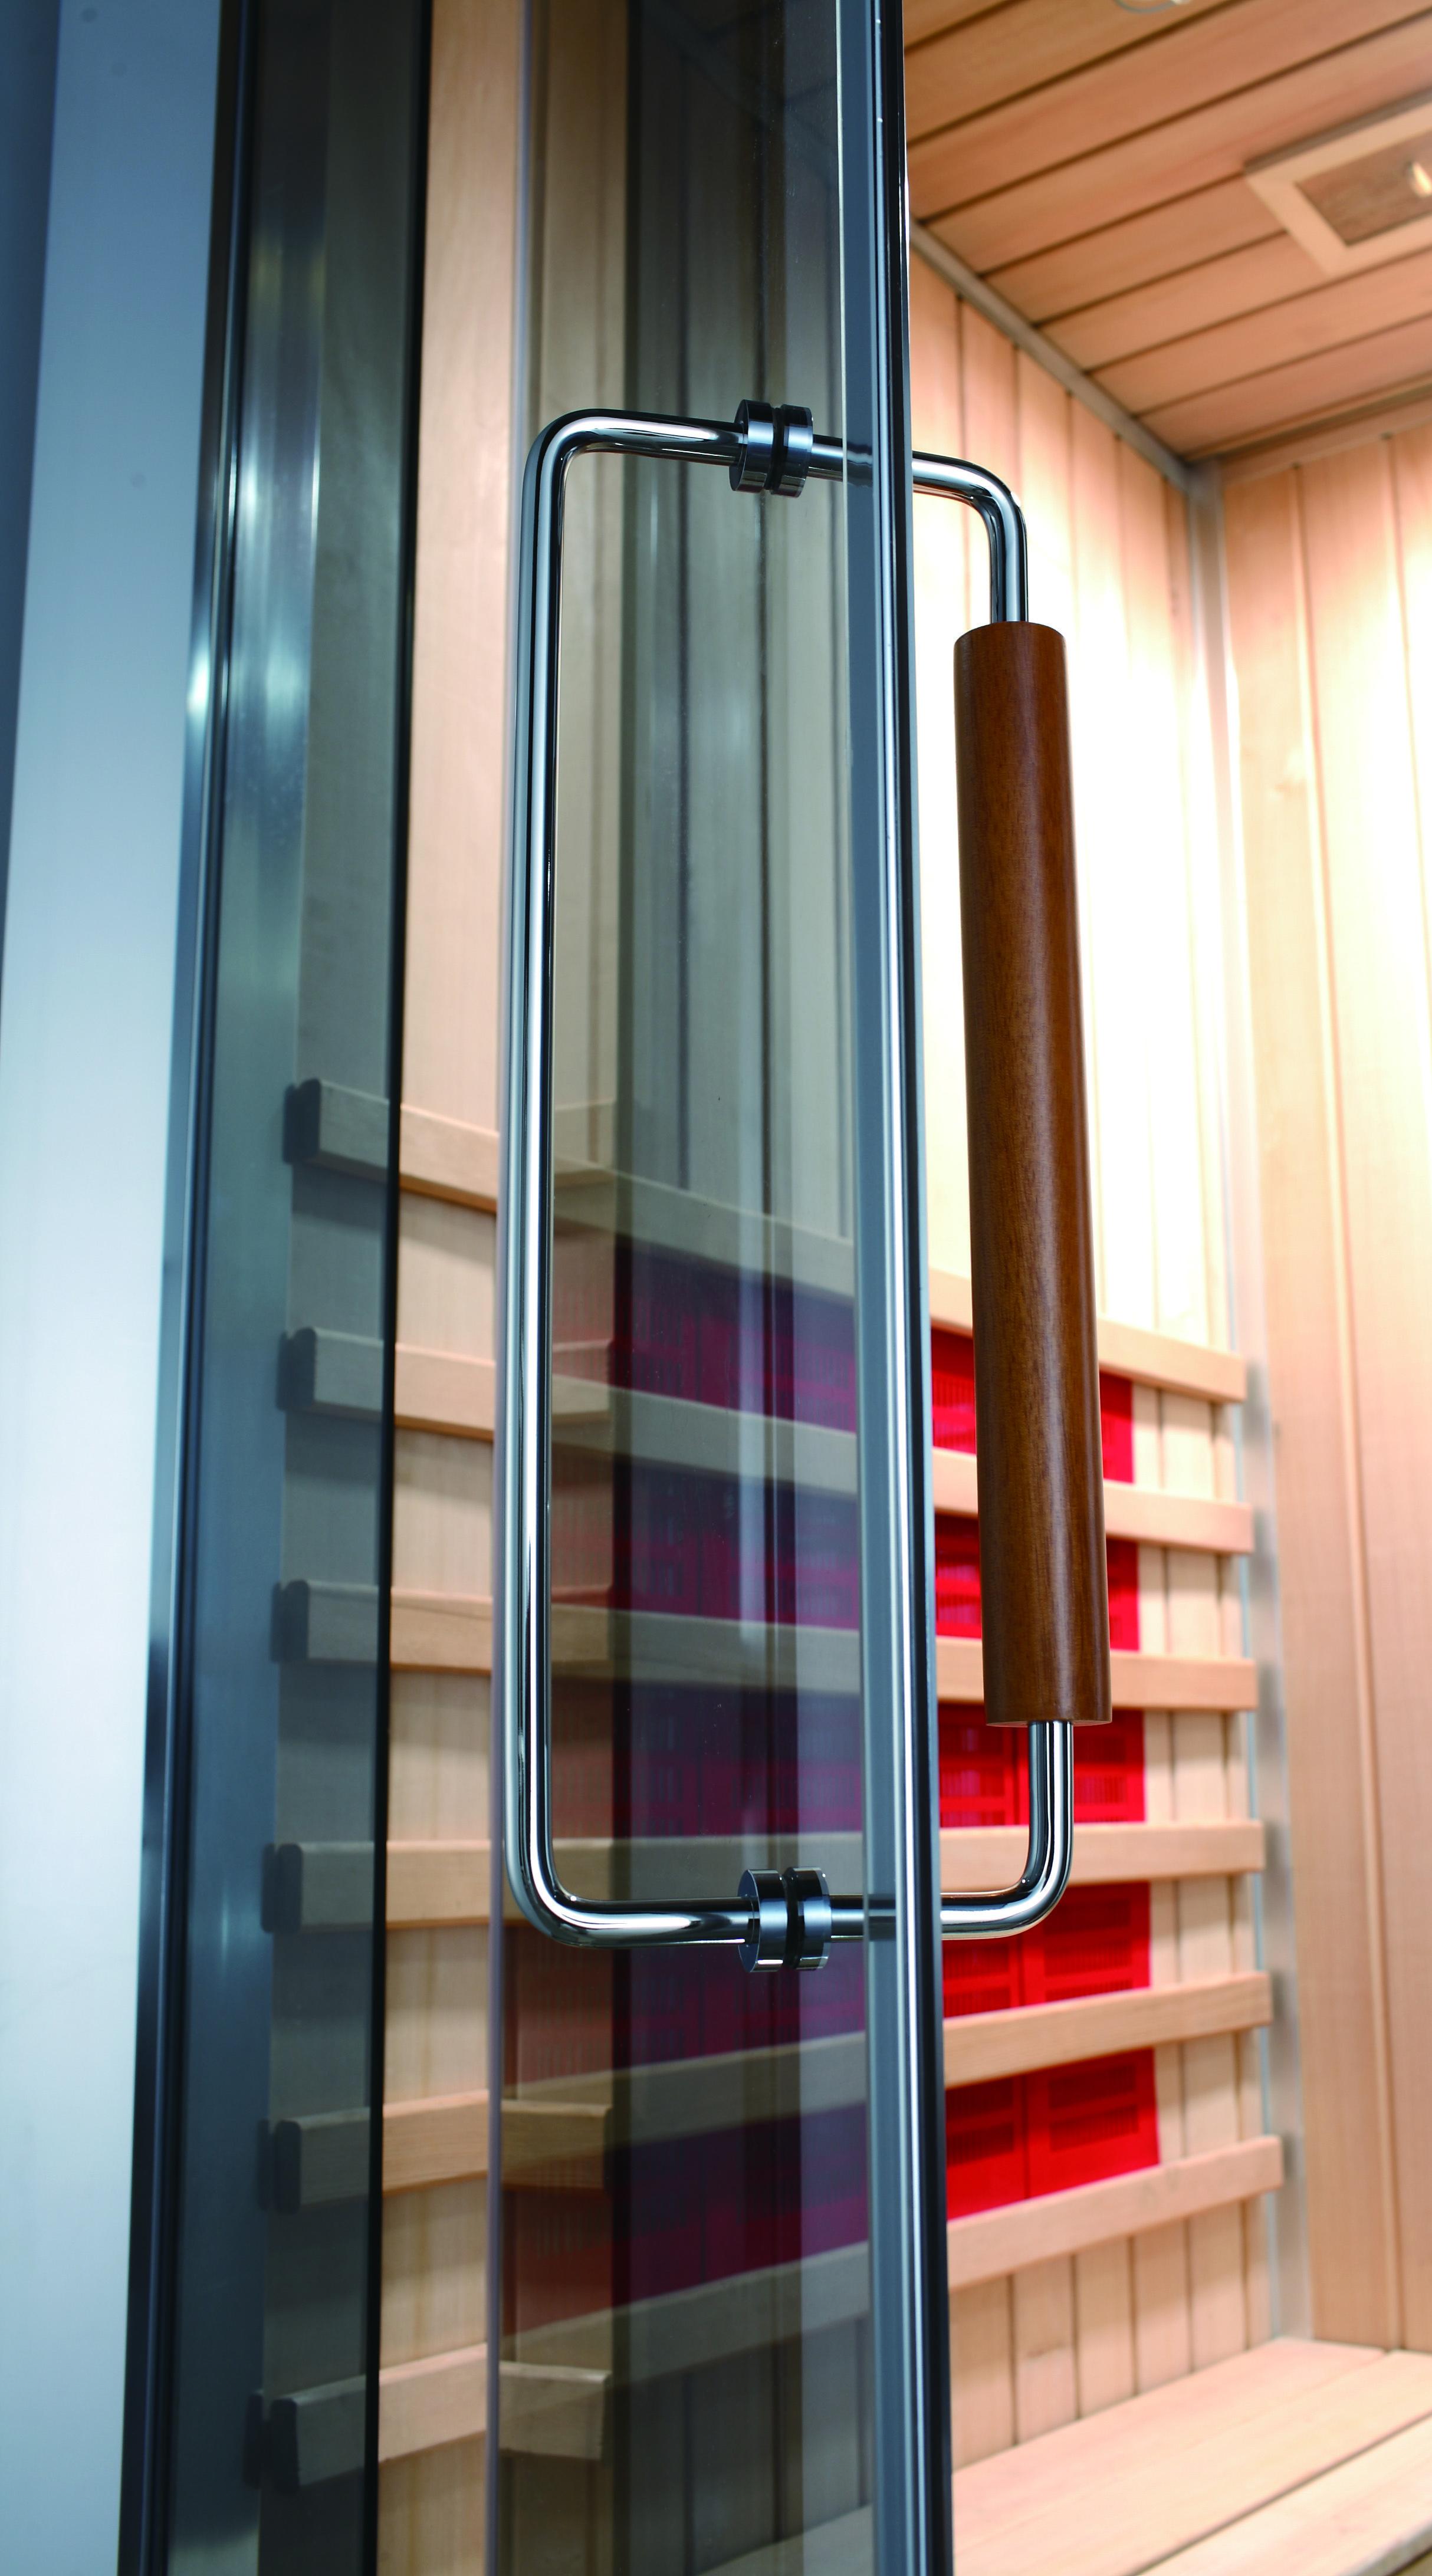 combin douche hammam sauna big miami. Black Bedroom Furniture Sets. Home Design Ideas